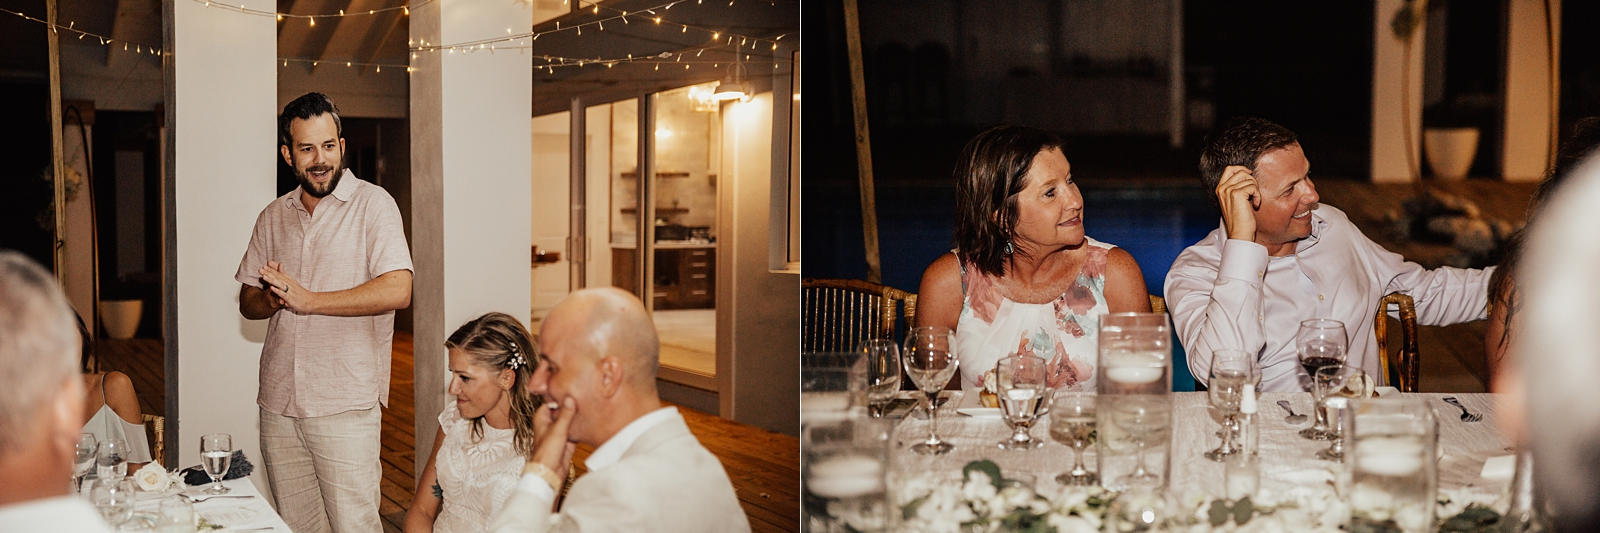 Jenni & Andrew Intimate Beach Destination Wedding in Little Exuma, Bahamas_0536.jpg